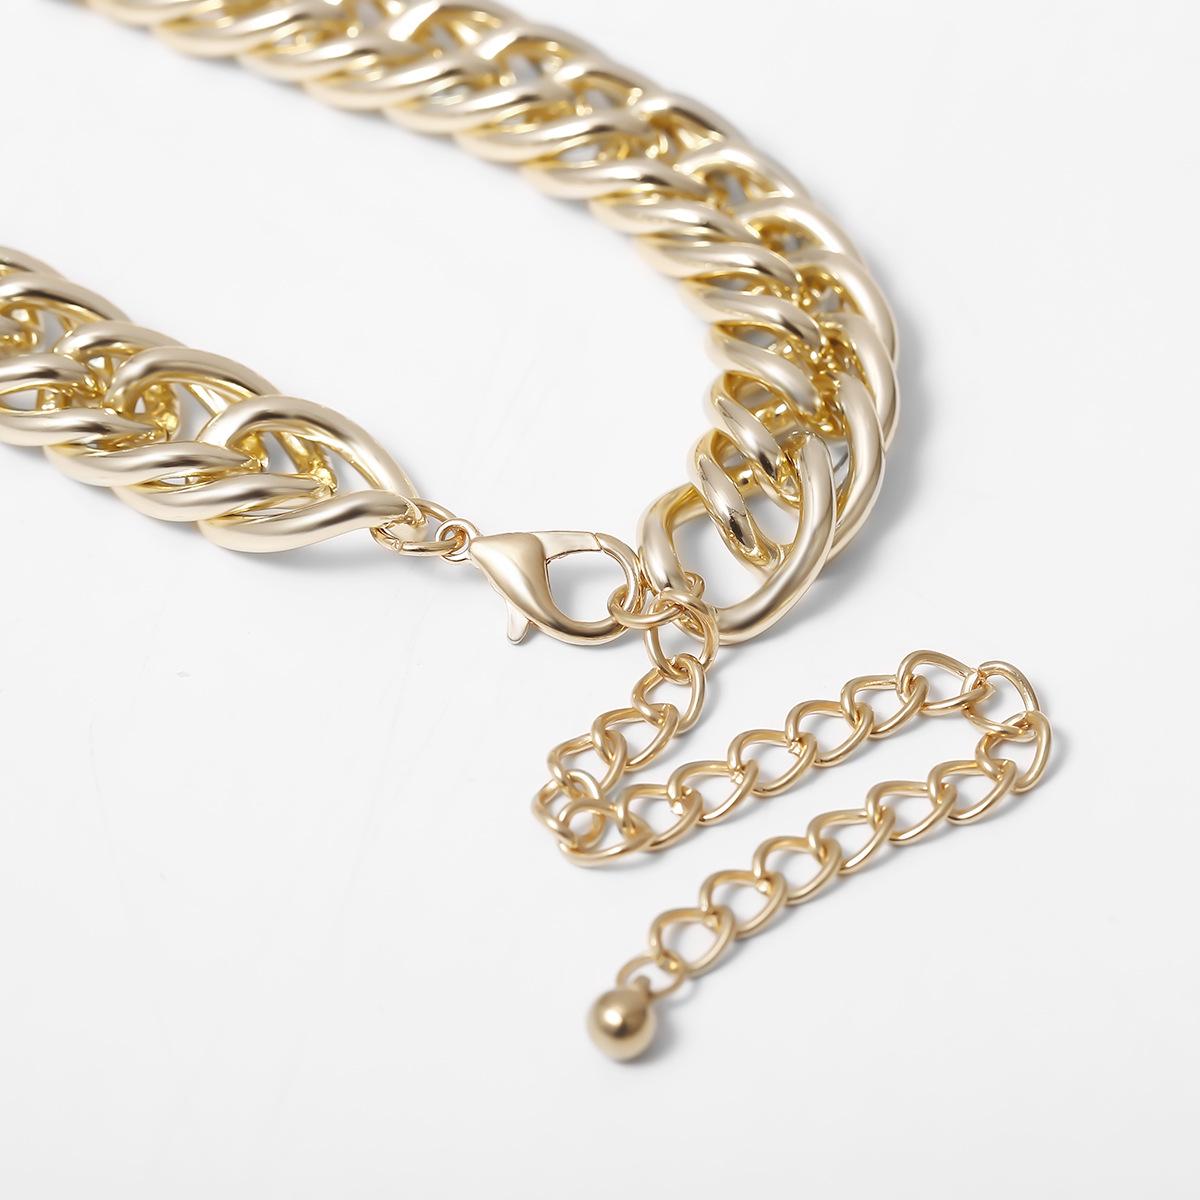 Personalized Simple Trend Necklace Bracelet Set NHXR190915